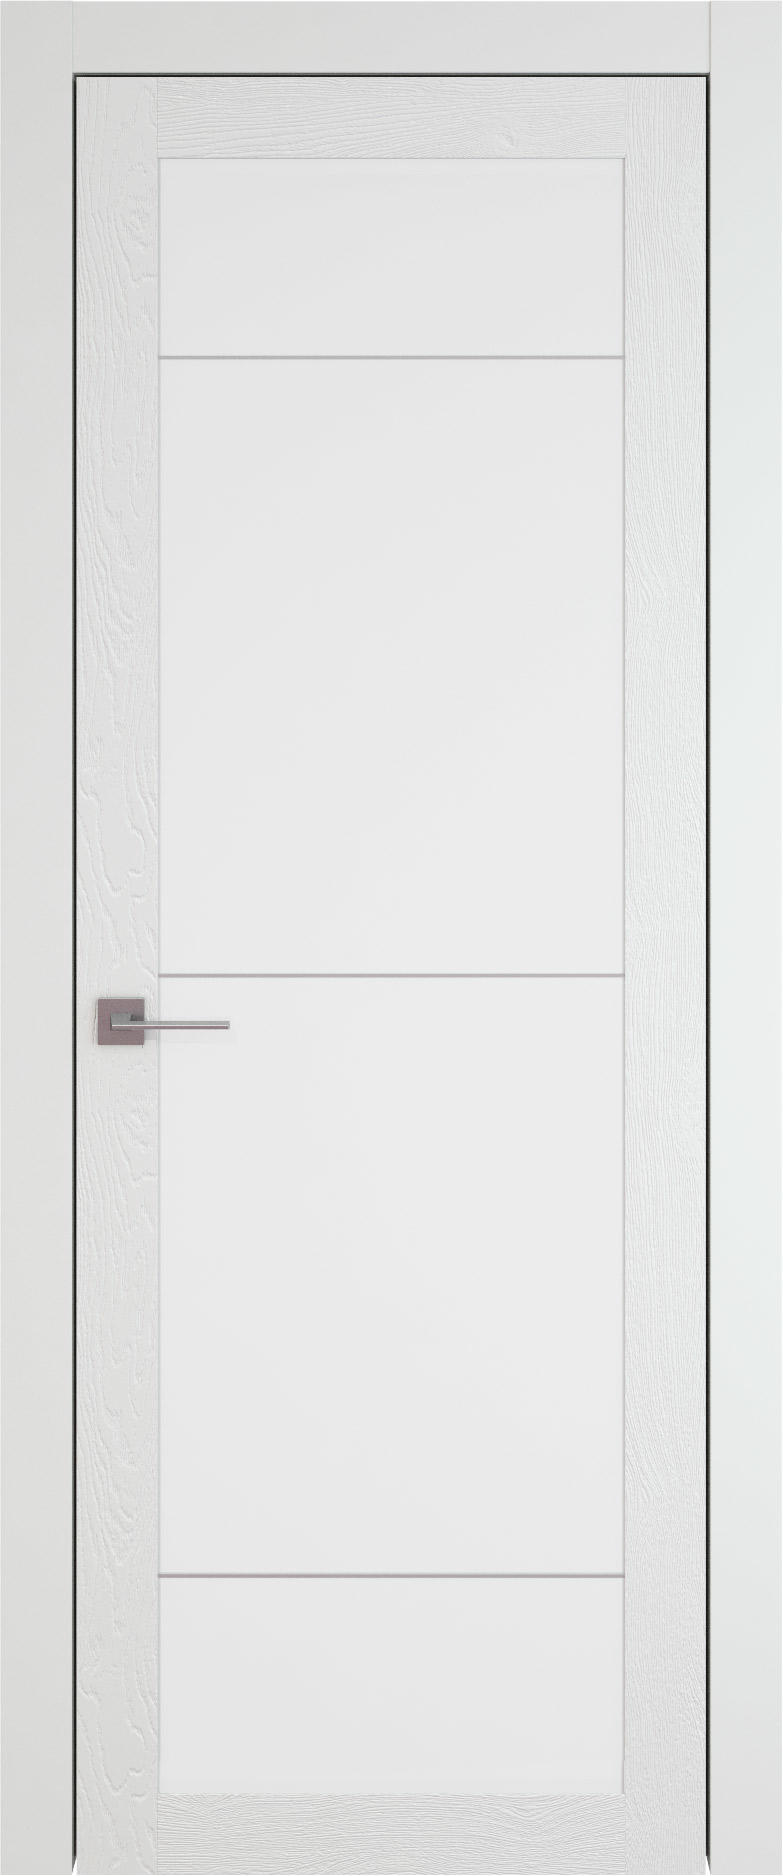 Tivoli З-3 цвет - Белая эмаль по шпону (RAL 9003) Со стеклом (ДО)